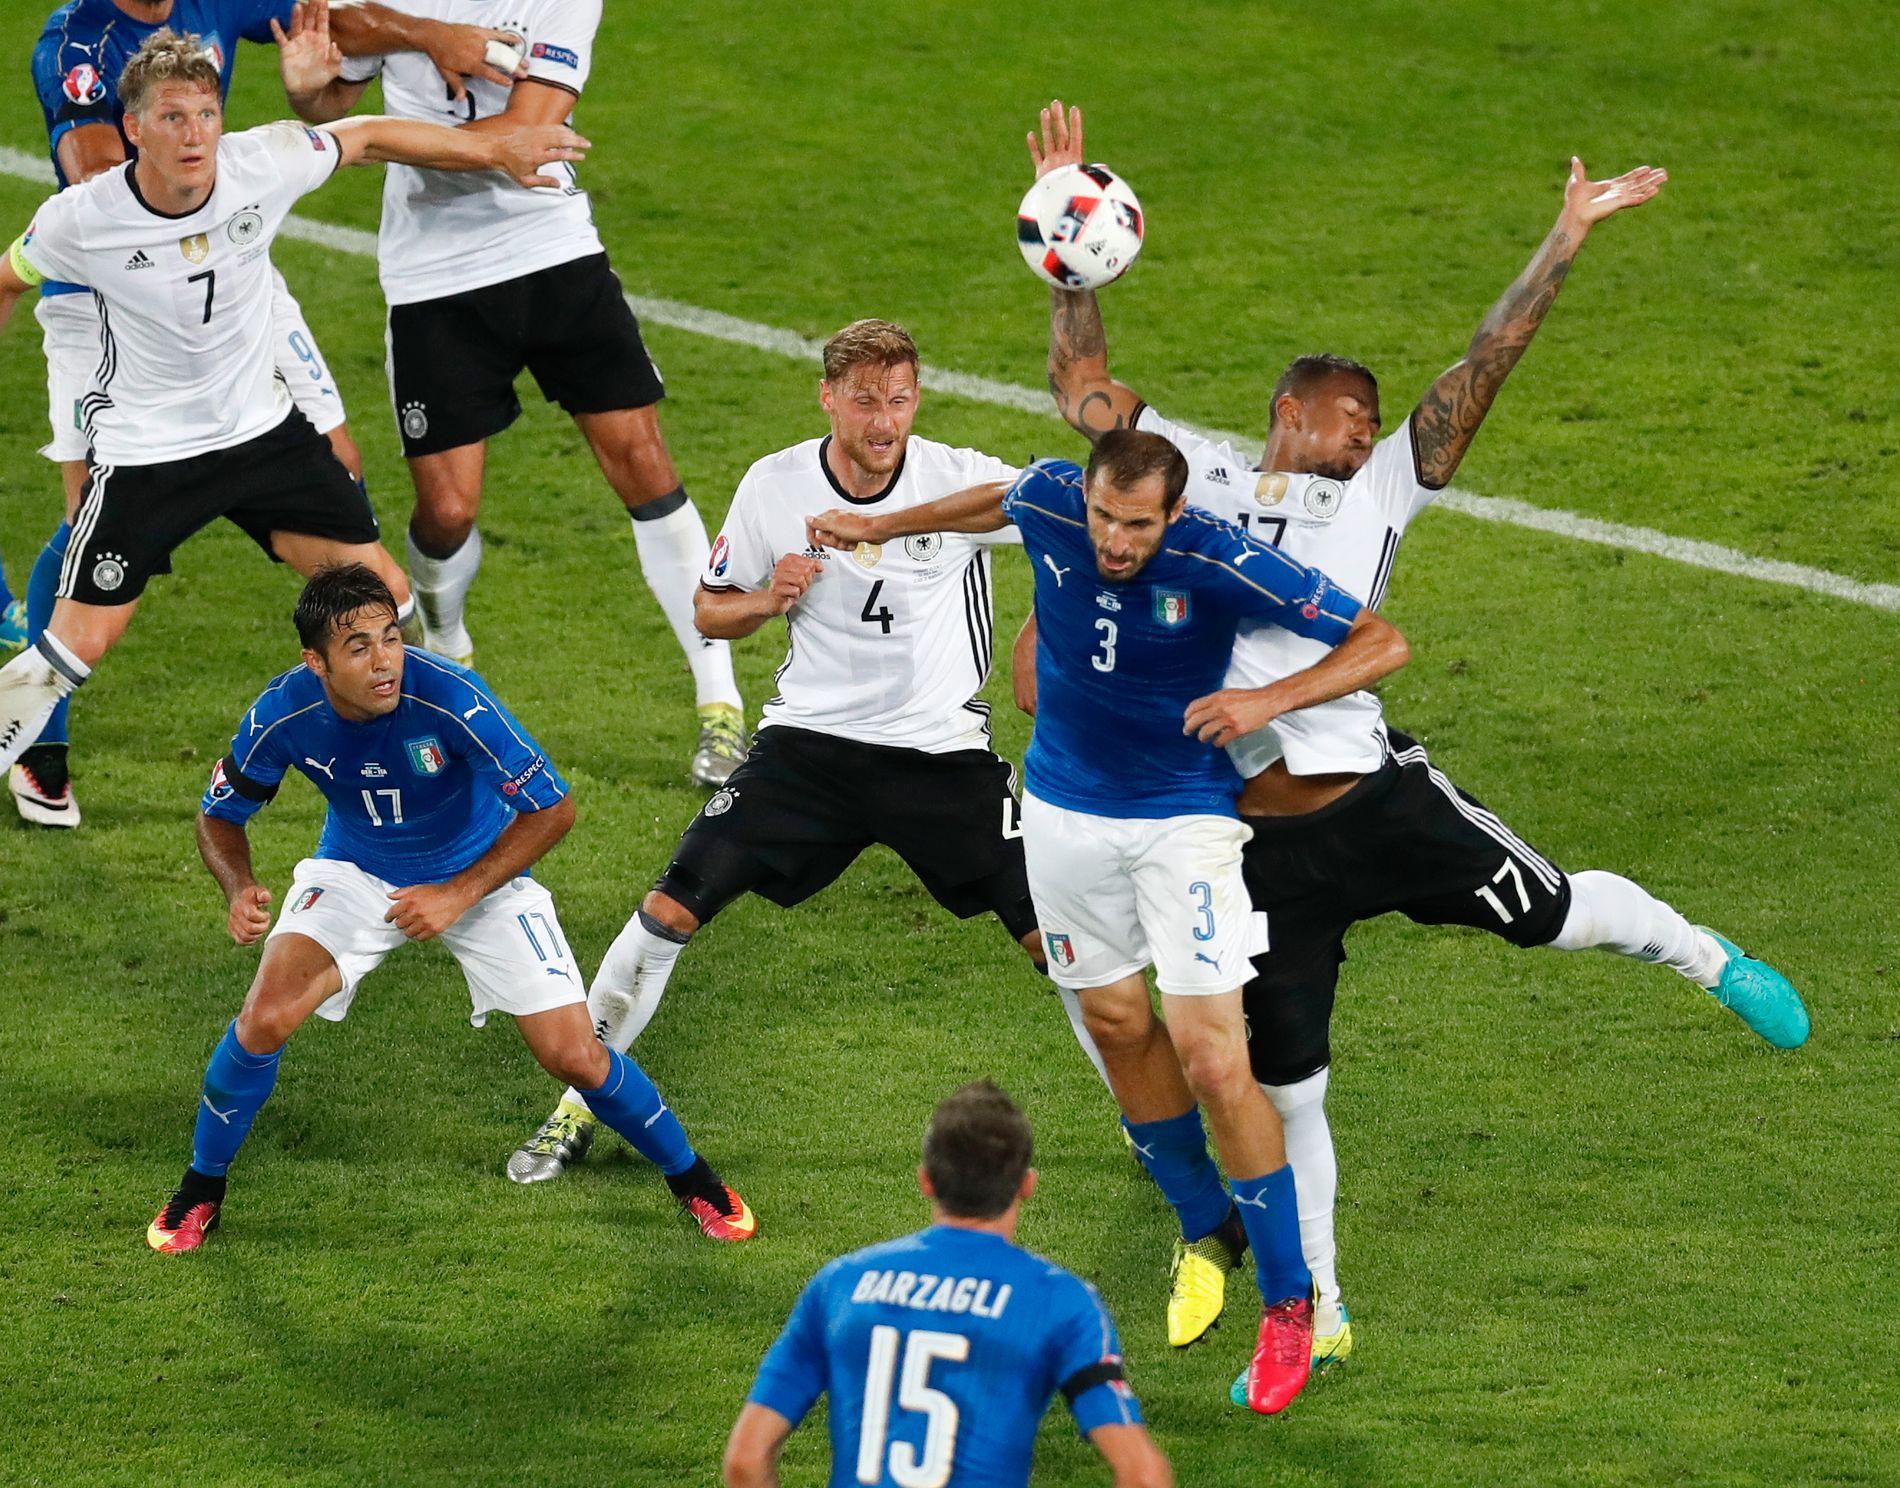 LAGET STRAFFE: Her handser tyske Jérôme Boateng, i duell med Italias Giorgio Chiellini, og lager straffespark til Italia under EM-kvartfinalen.